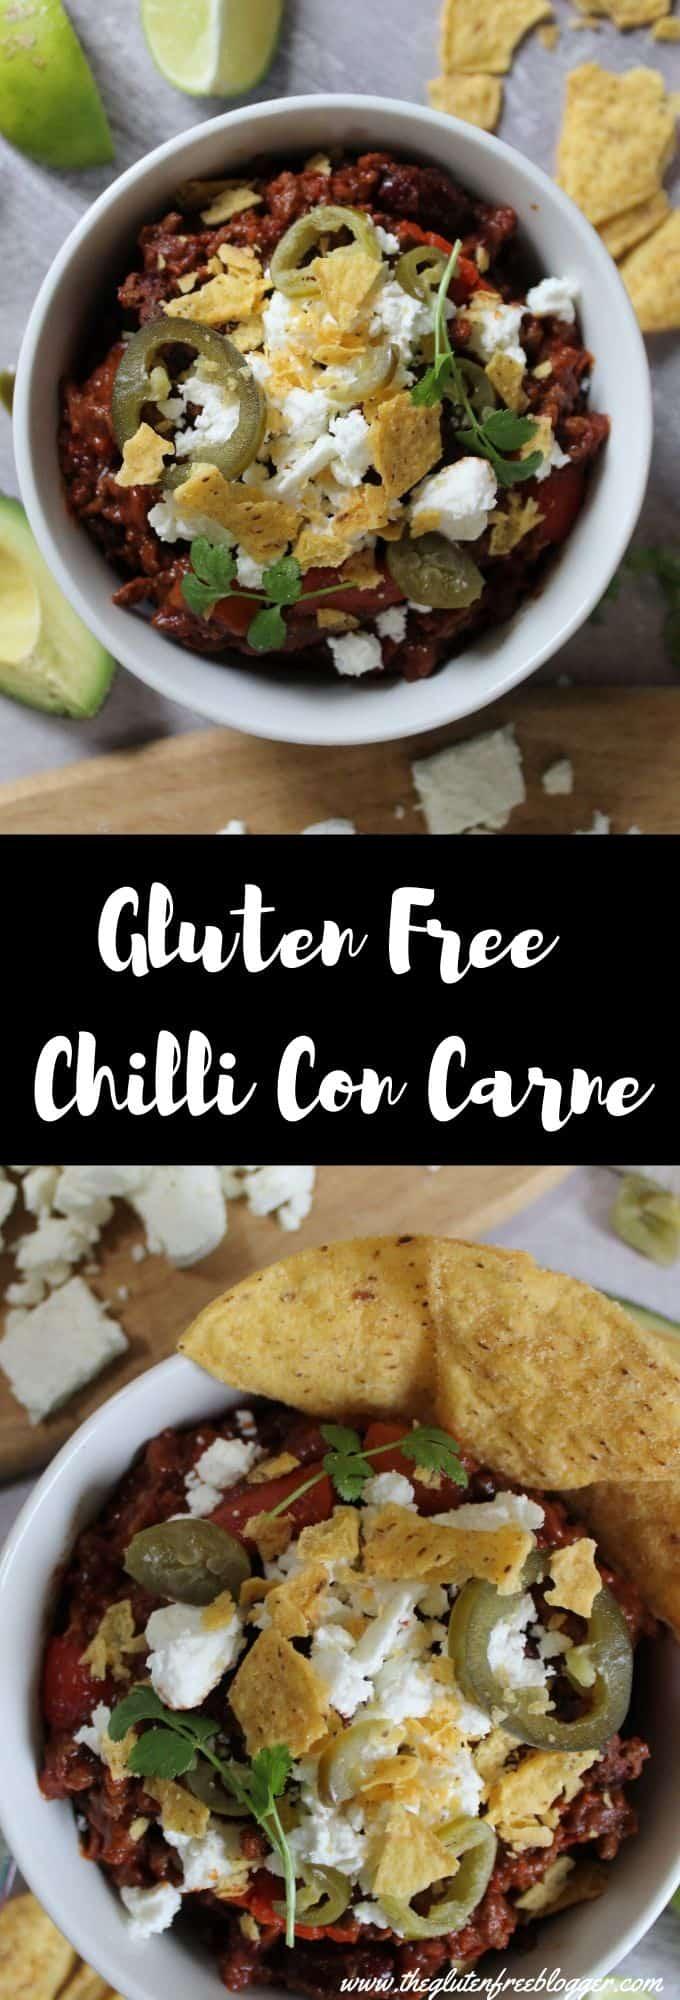 gluten free chilli con carne recipe coeliac celiac dairy free beef chilli nachos dinner ideas batch cooking